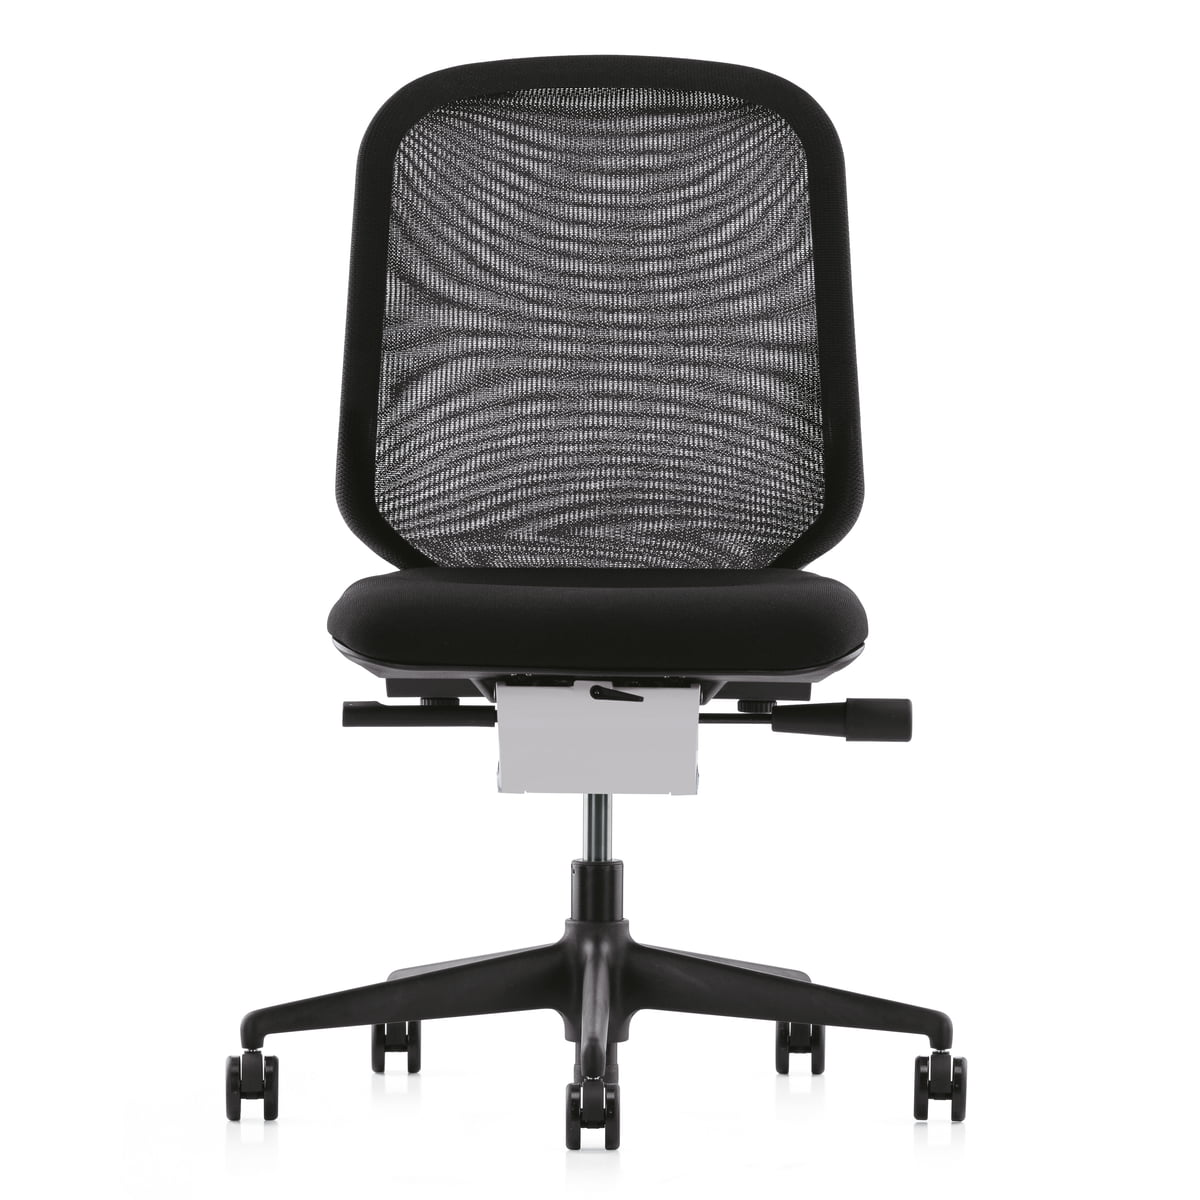 Vitra - MedaPal, schwarz, Hartbodenrollen | Büro > Bürostühle und Sessel  > Bürostühle-Zubehör | Schwarz | Gestell: polyamid glasfaserverstärkt -  sitzbezug: nova (schwarz) -  rückenbezug: netline (schwarz) | Vitra